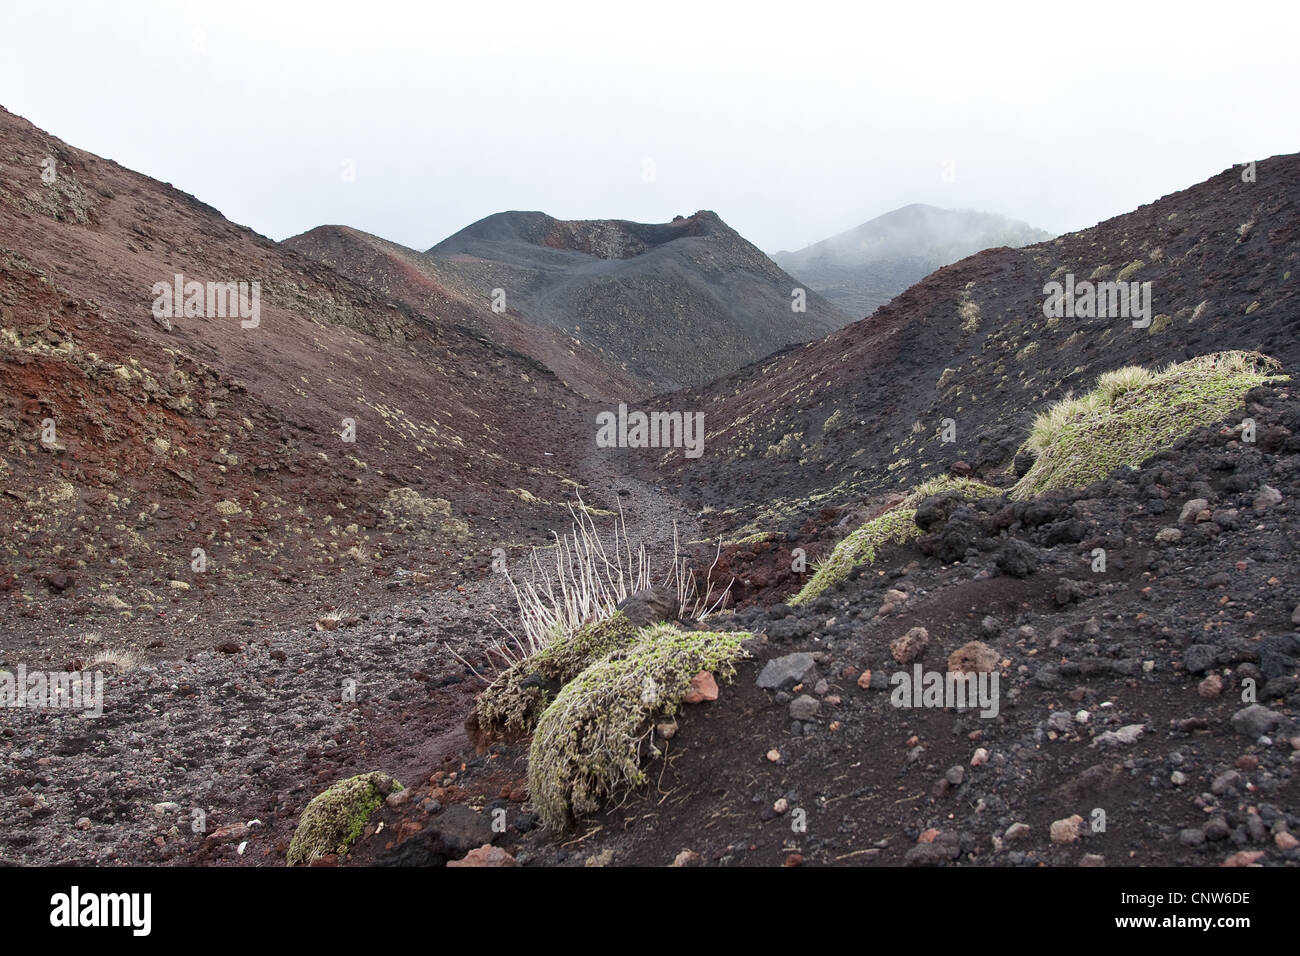 Vulkanlandschaften am Ätna mit Zwergsträucher, Italien, Sizilien Stockfoto